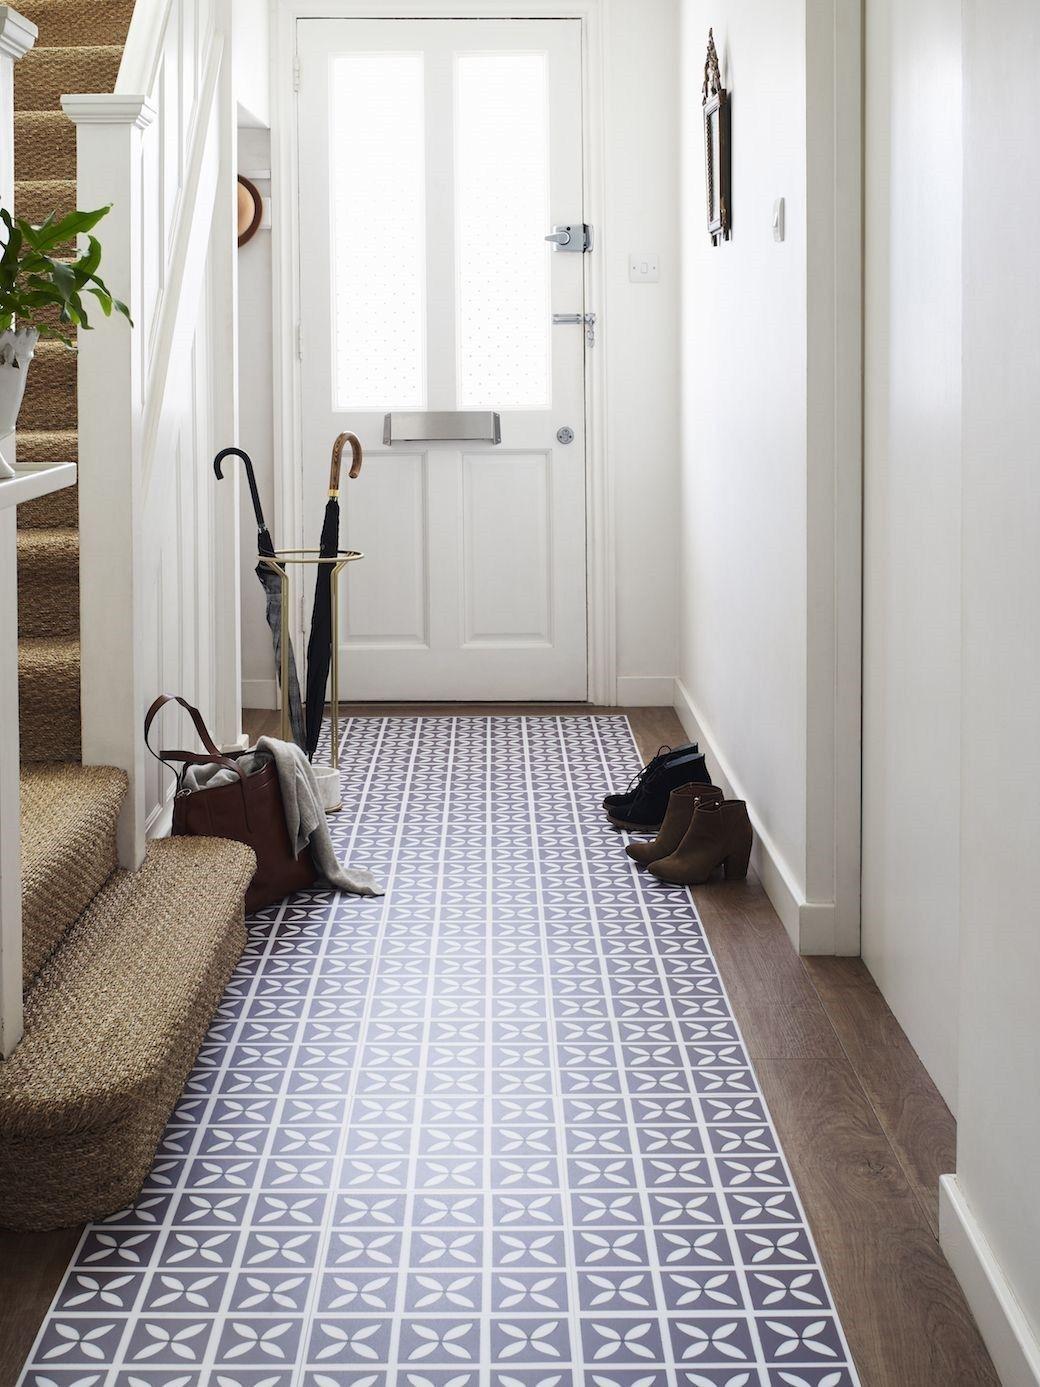 Glavnaya Hallway Flooring Tiled Hallway Hall Flooring